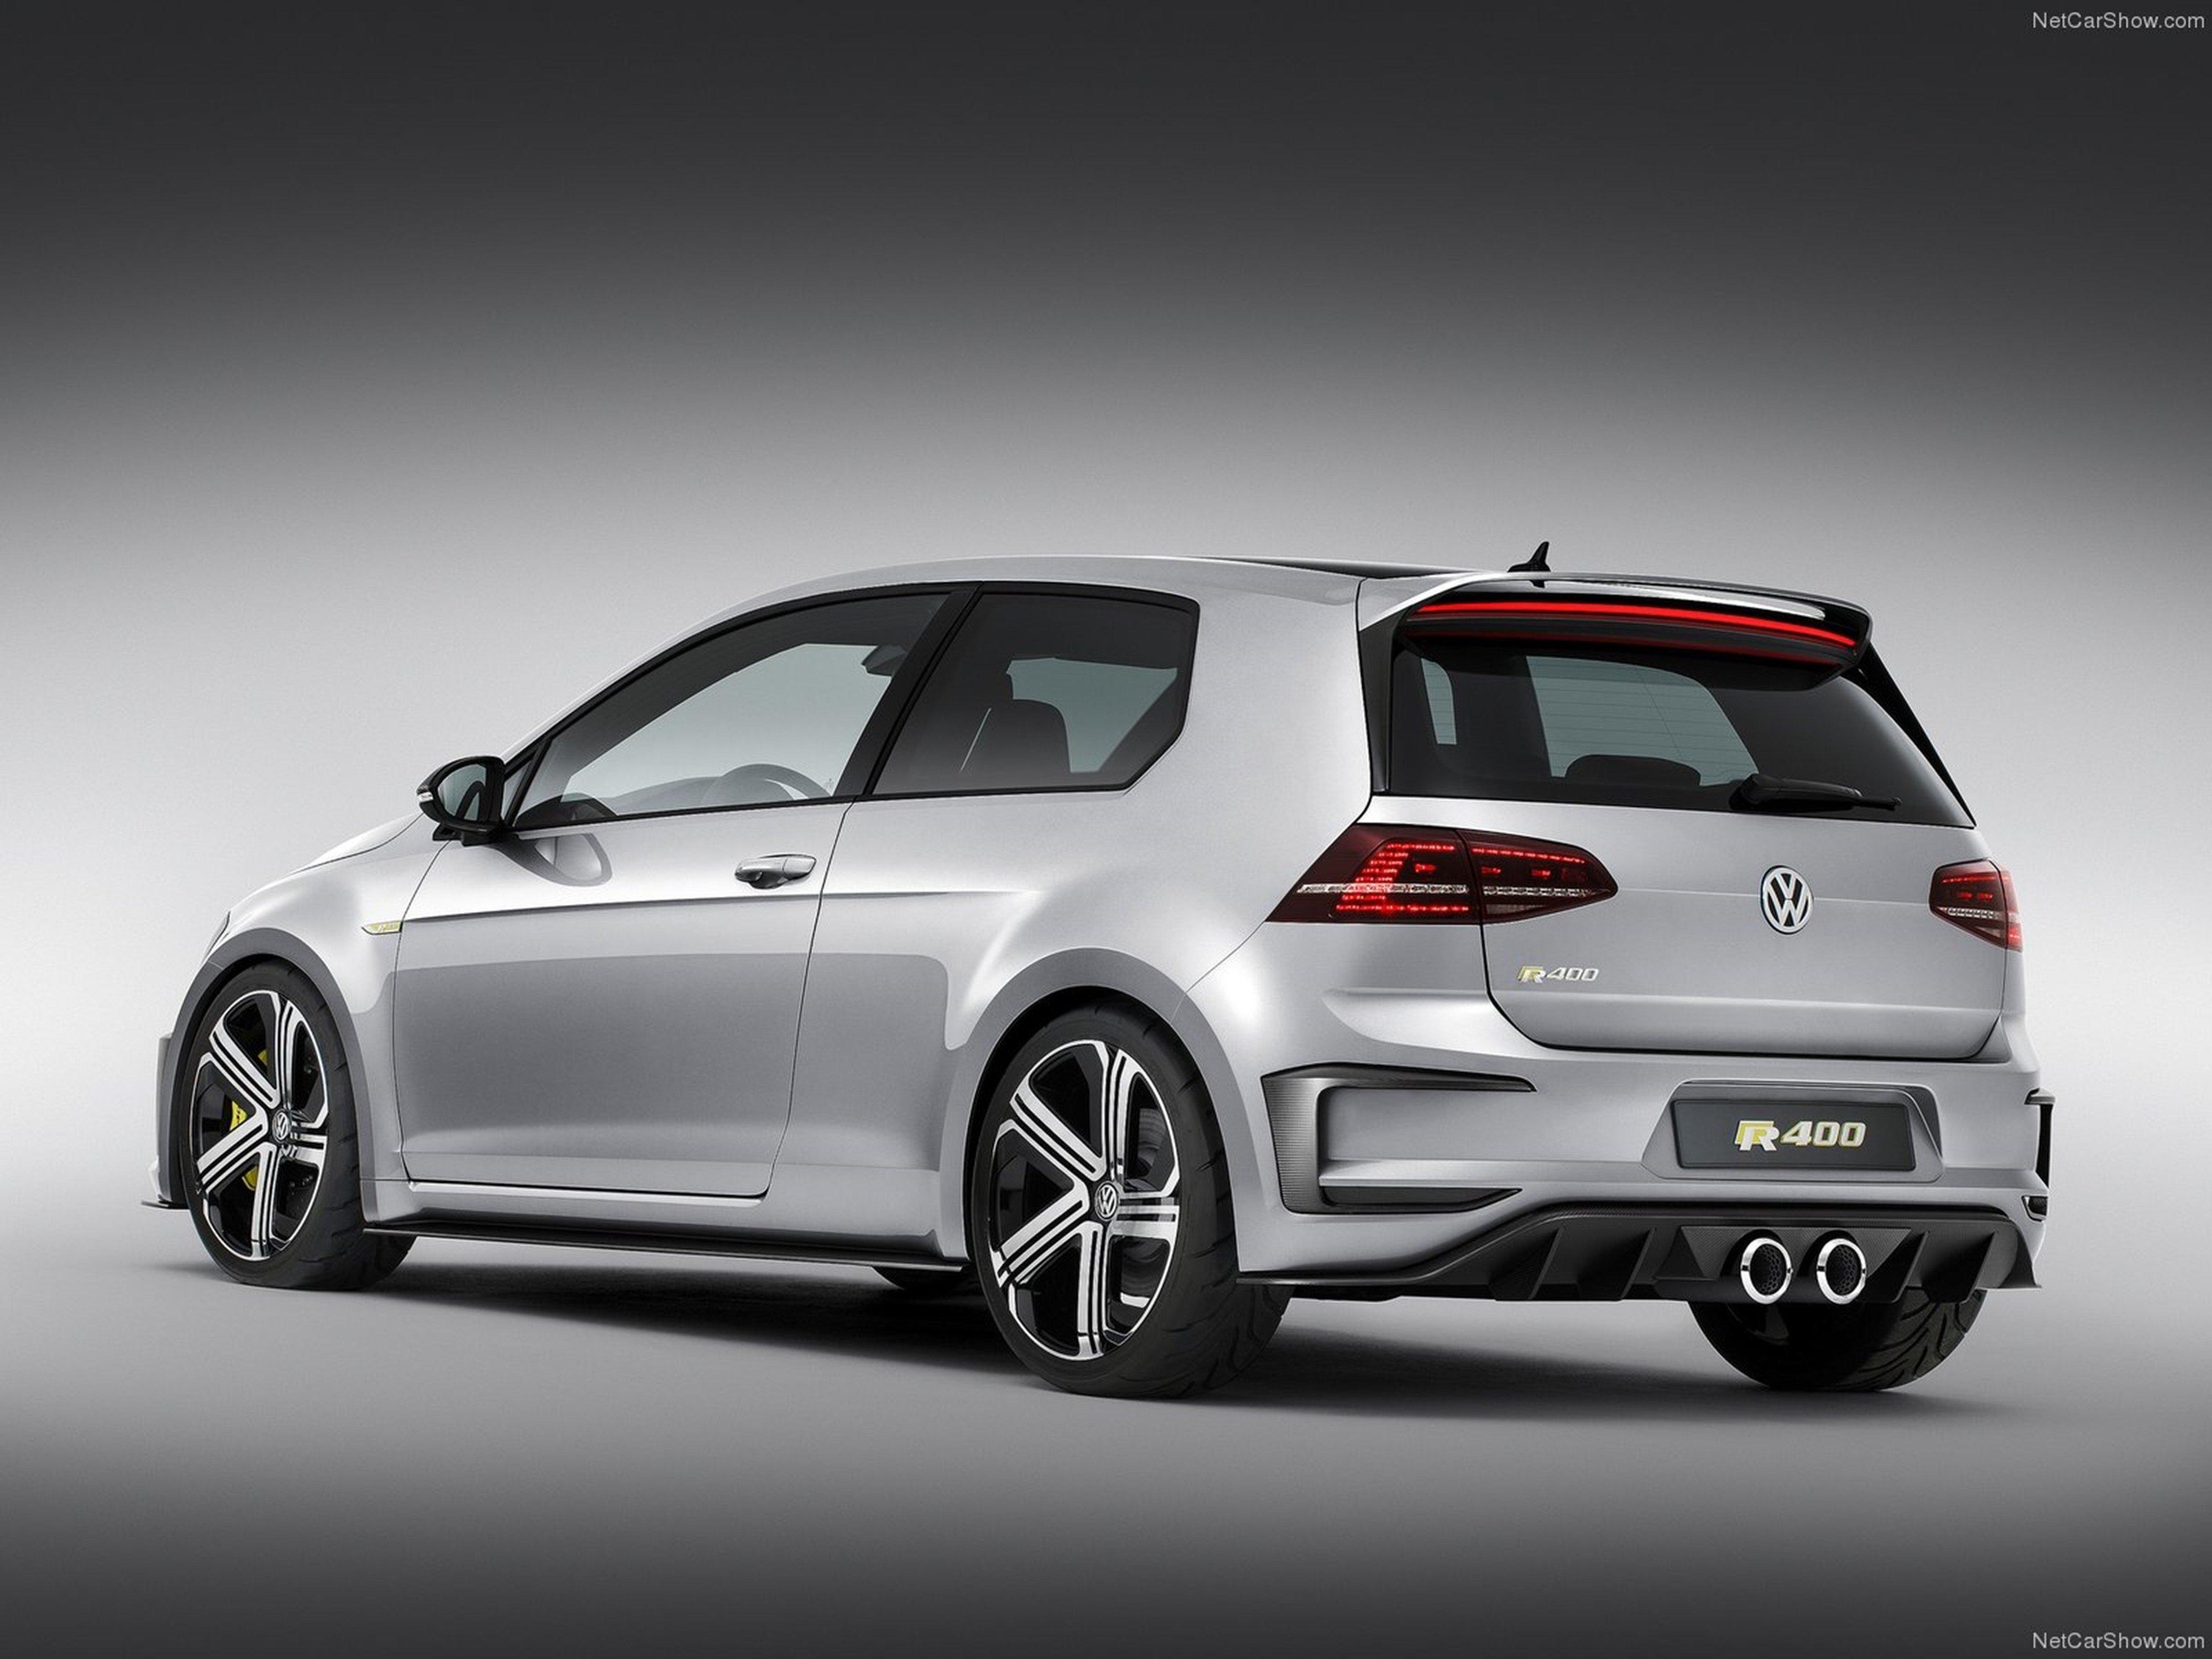 Volkswagen Golf R400 Concept 2014 Tunning Wallpaper 03 4000x3000